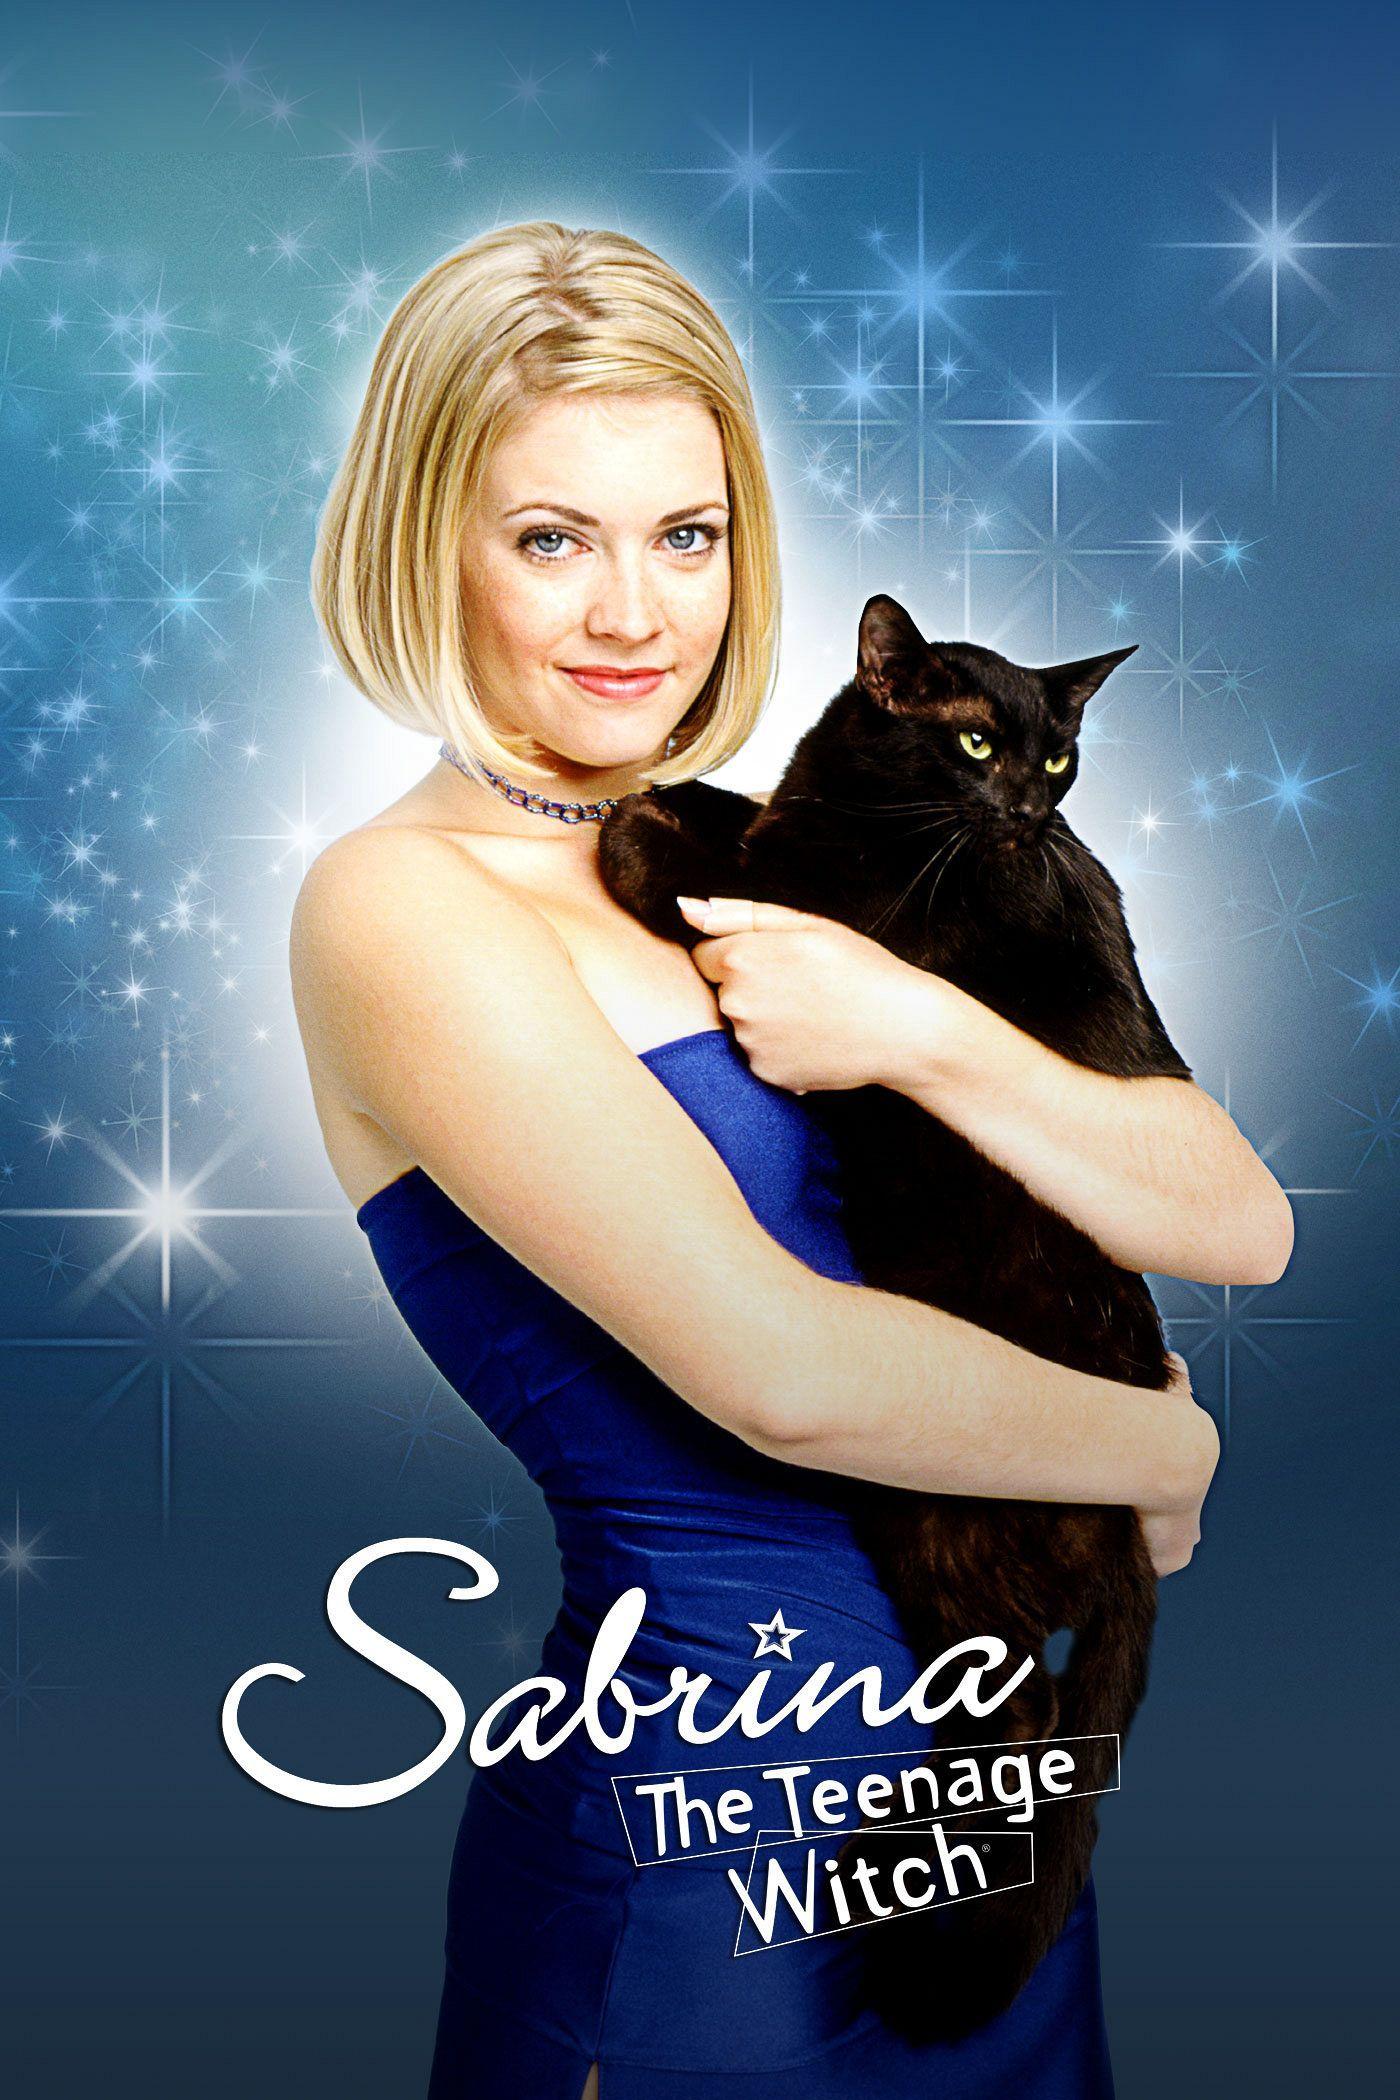 Sabrina, the Teenage Witch ne zaman